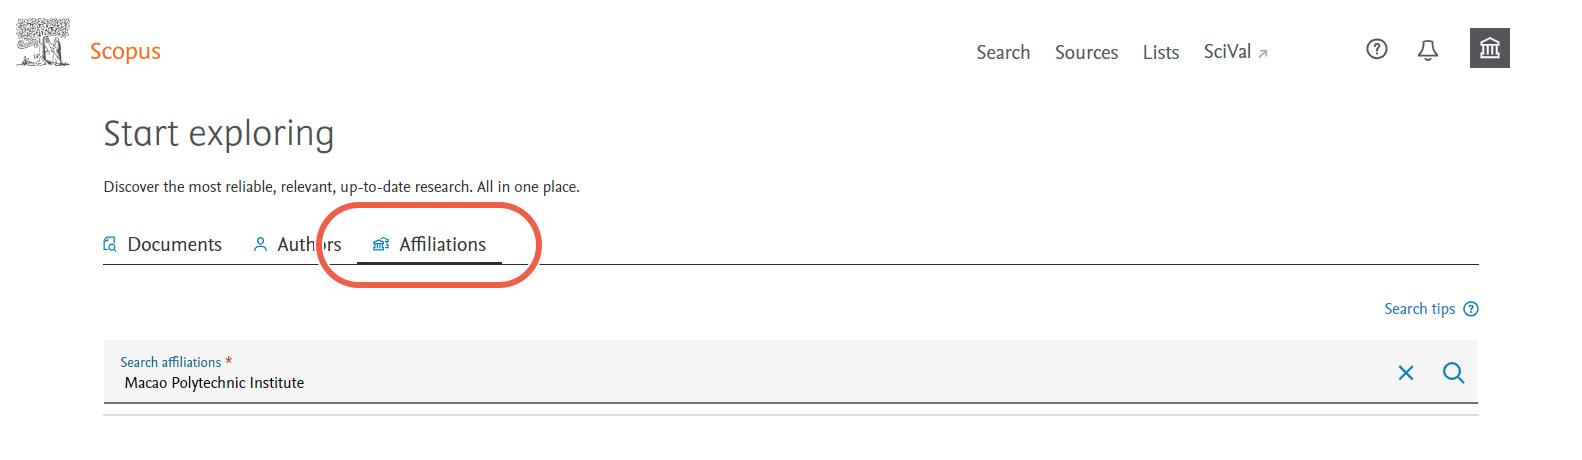 Scopus Search Affiliations Screenshot